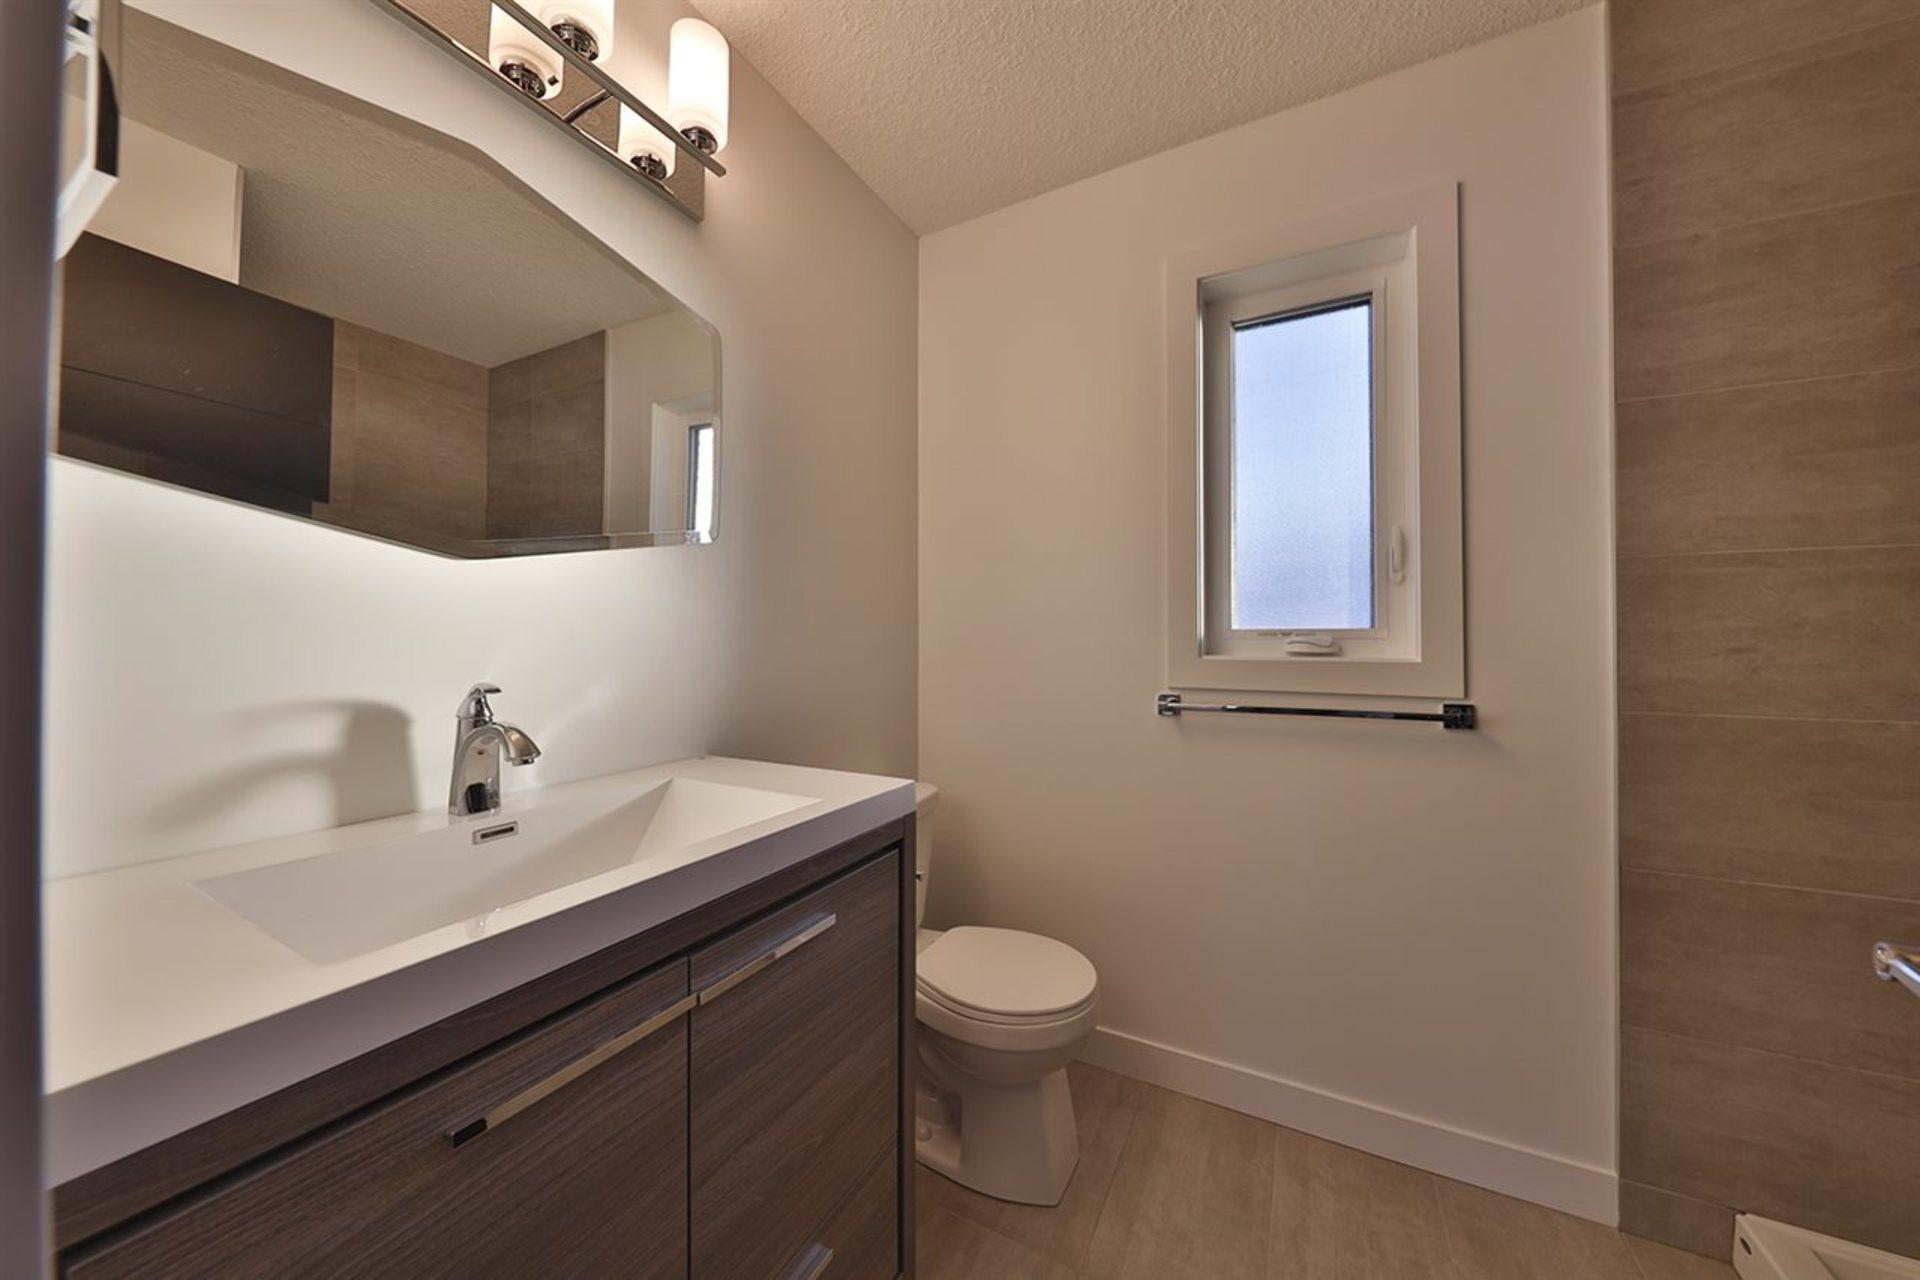 11638-84-street-parkdale_edmo-edmonton-10 at 11638 84 Street, Parkdale_EDMO, Edmonton